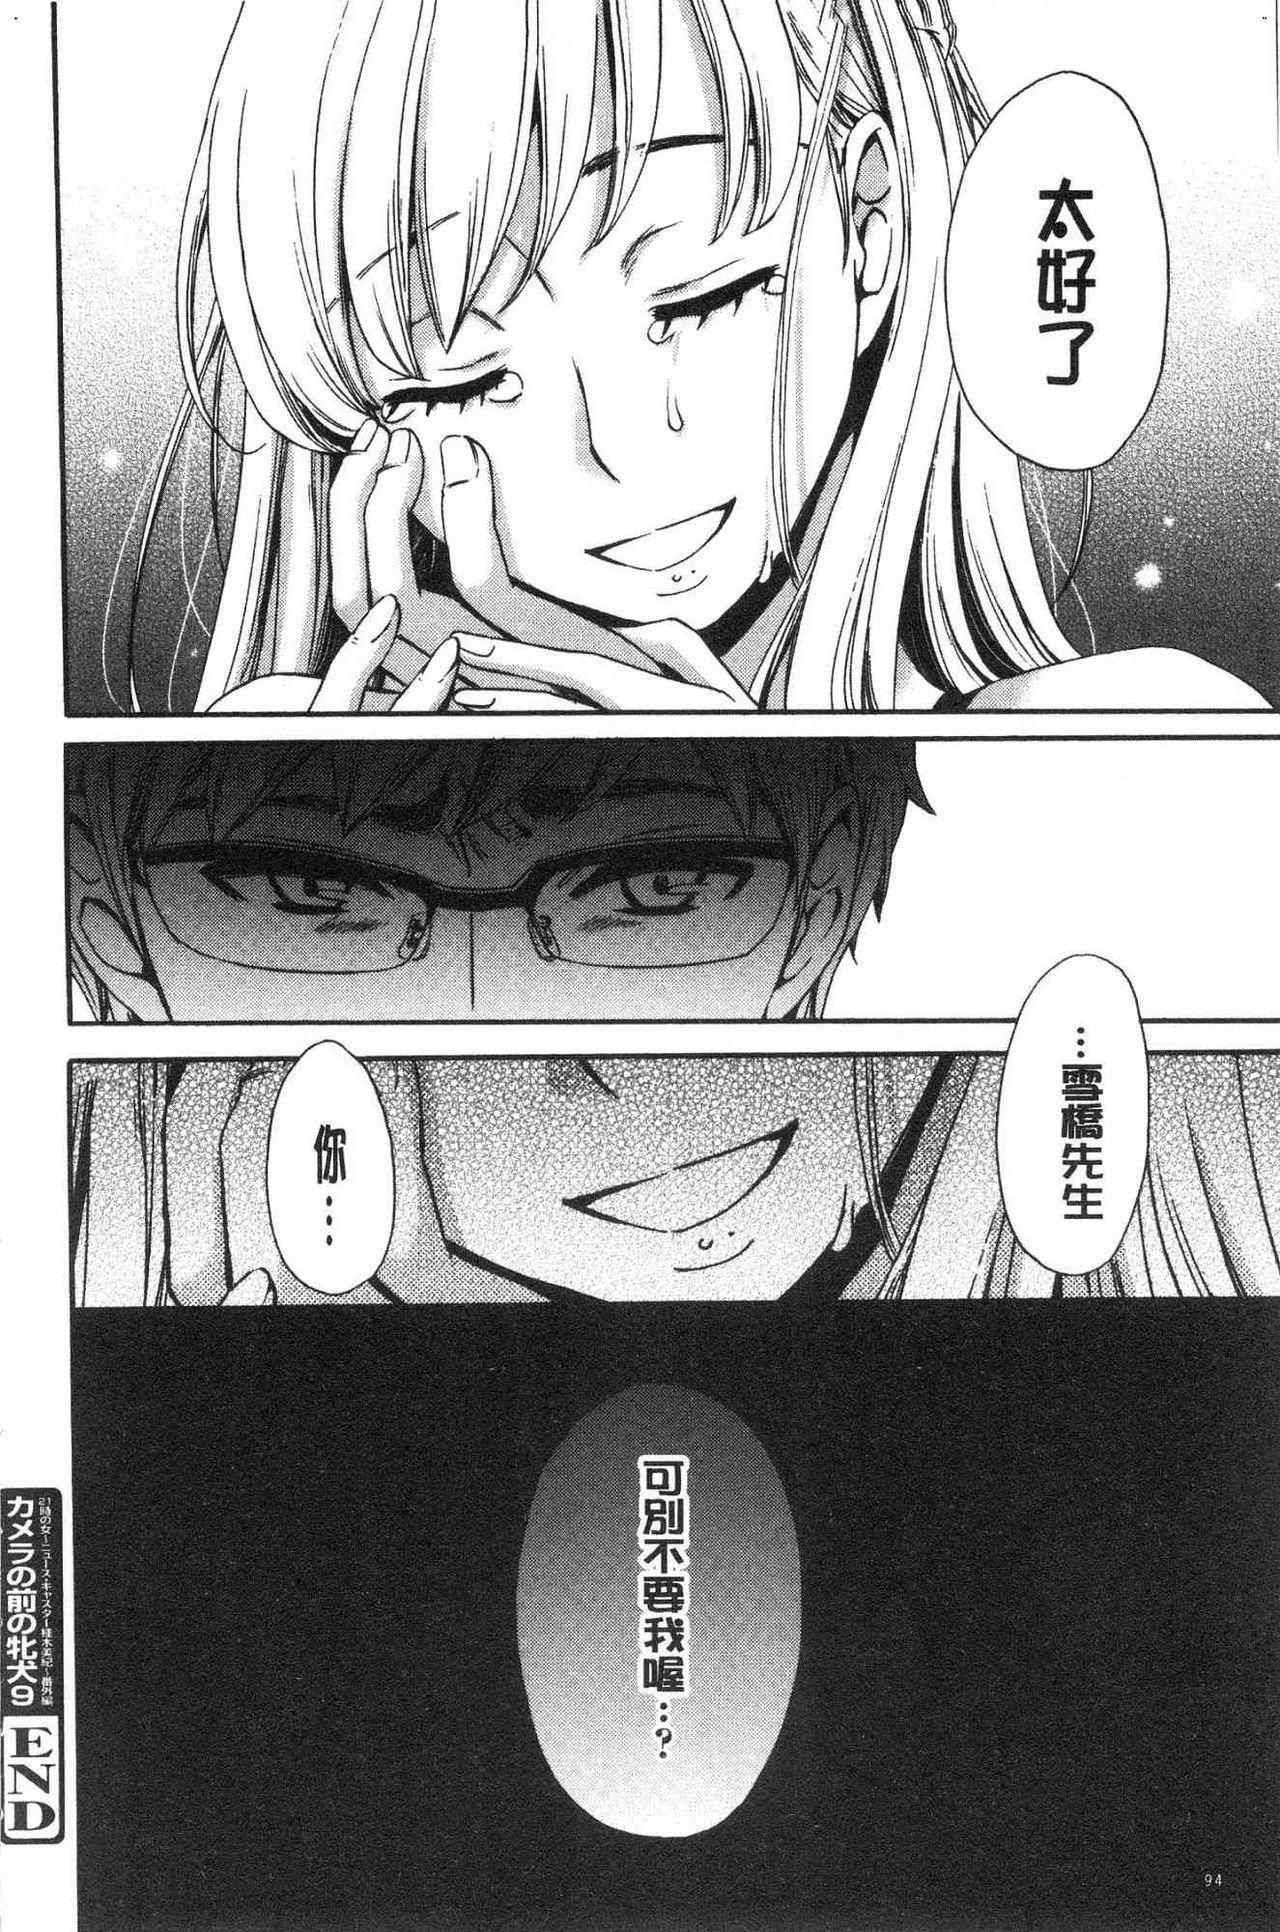 [Gotoh Akira]  21-ji no Onna ~Camera no Mae no Mesuinu~ 2 | 21時之女 ~鏡頭前的牝犬~ 2 [Chinese] 95